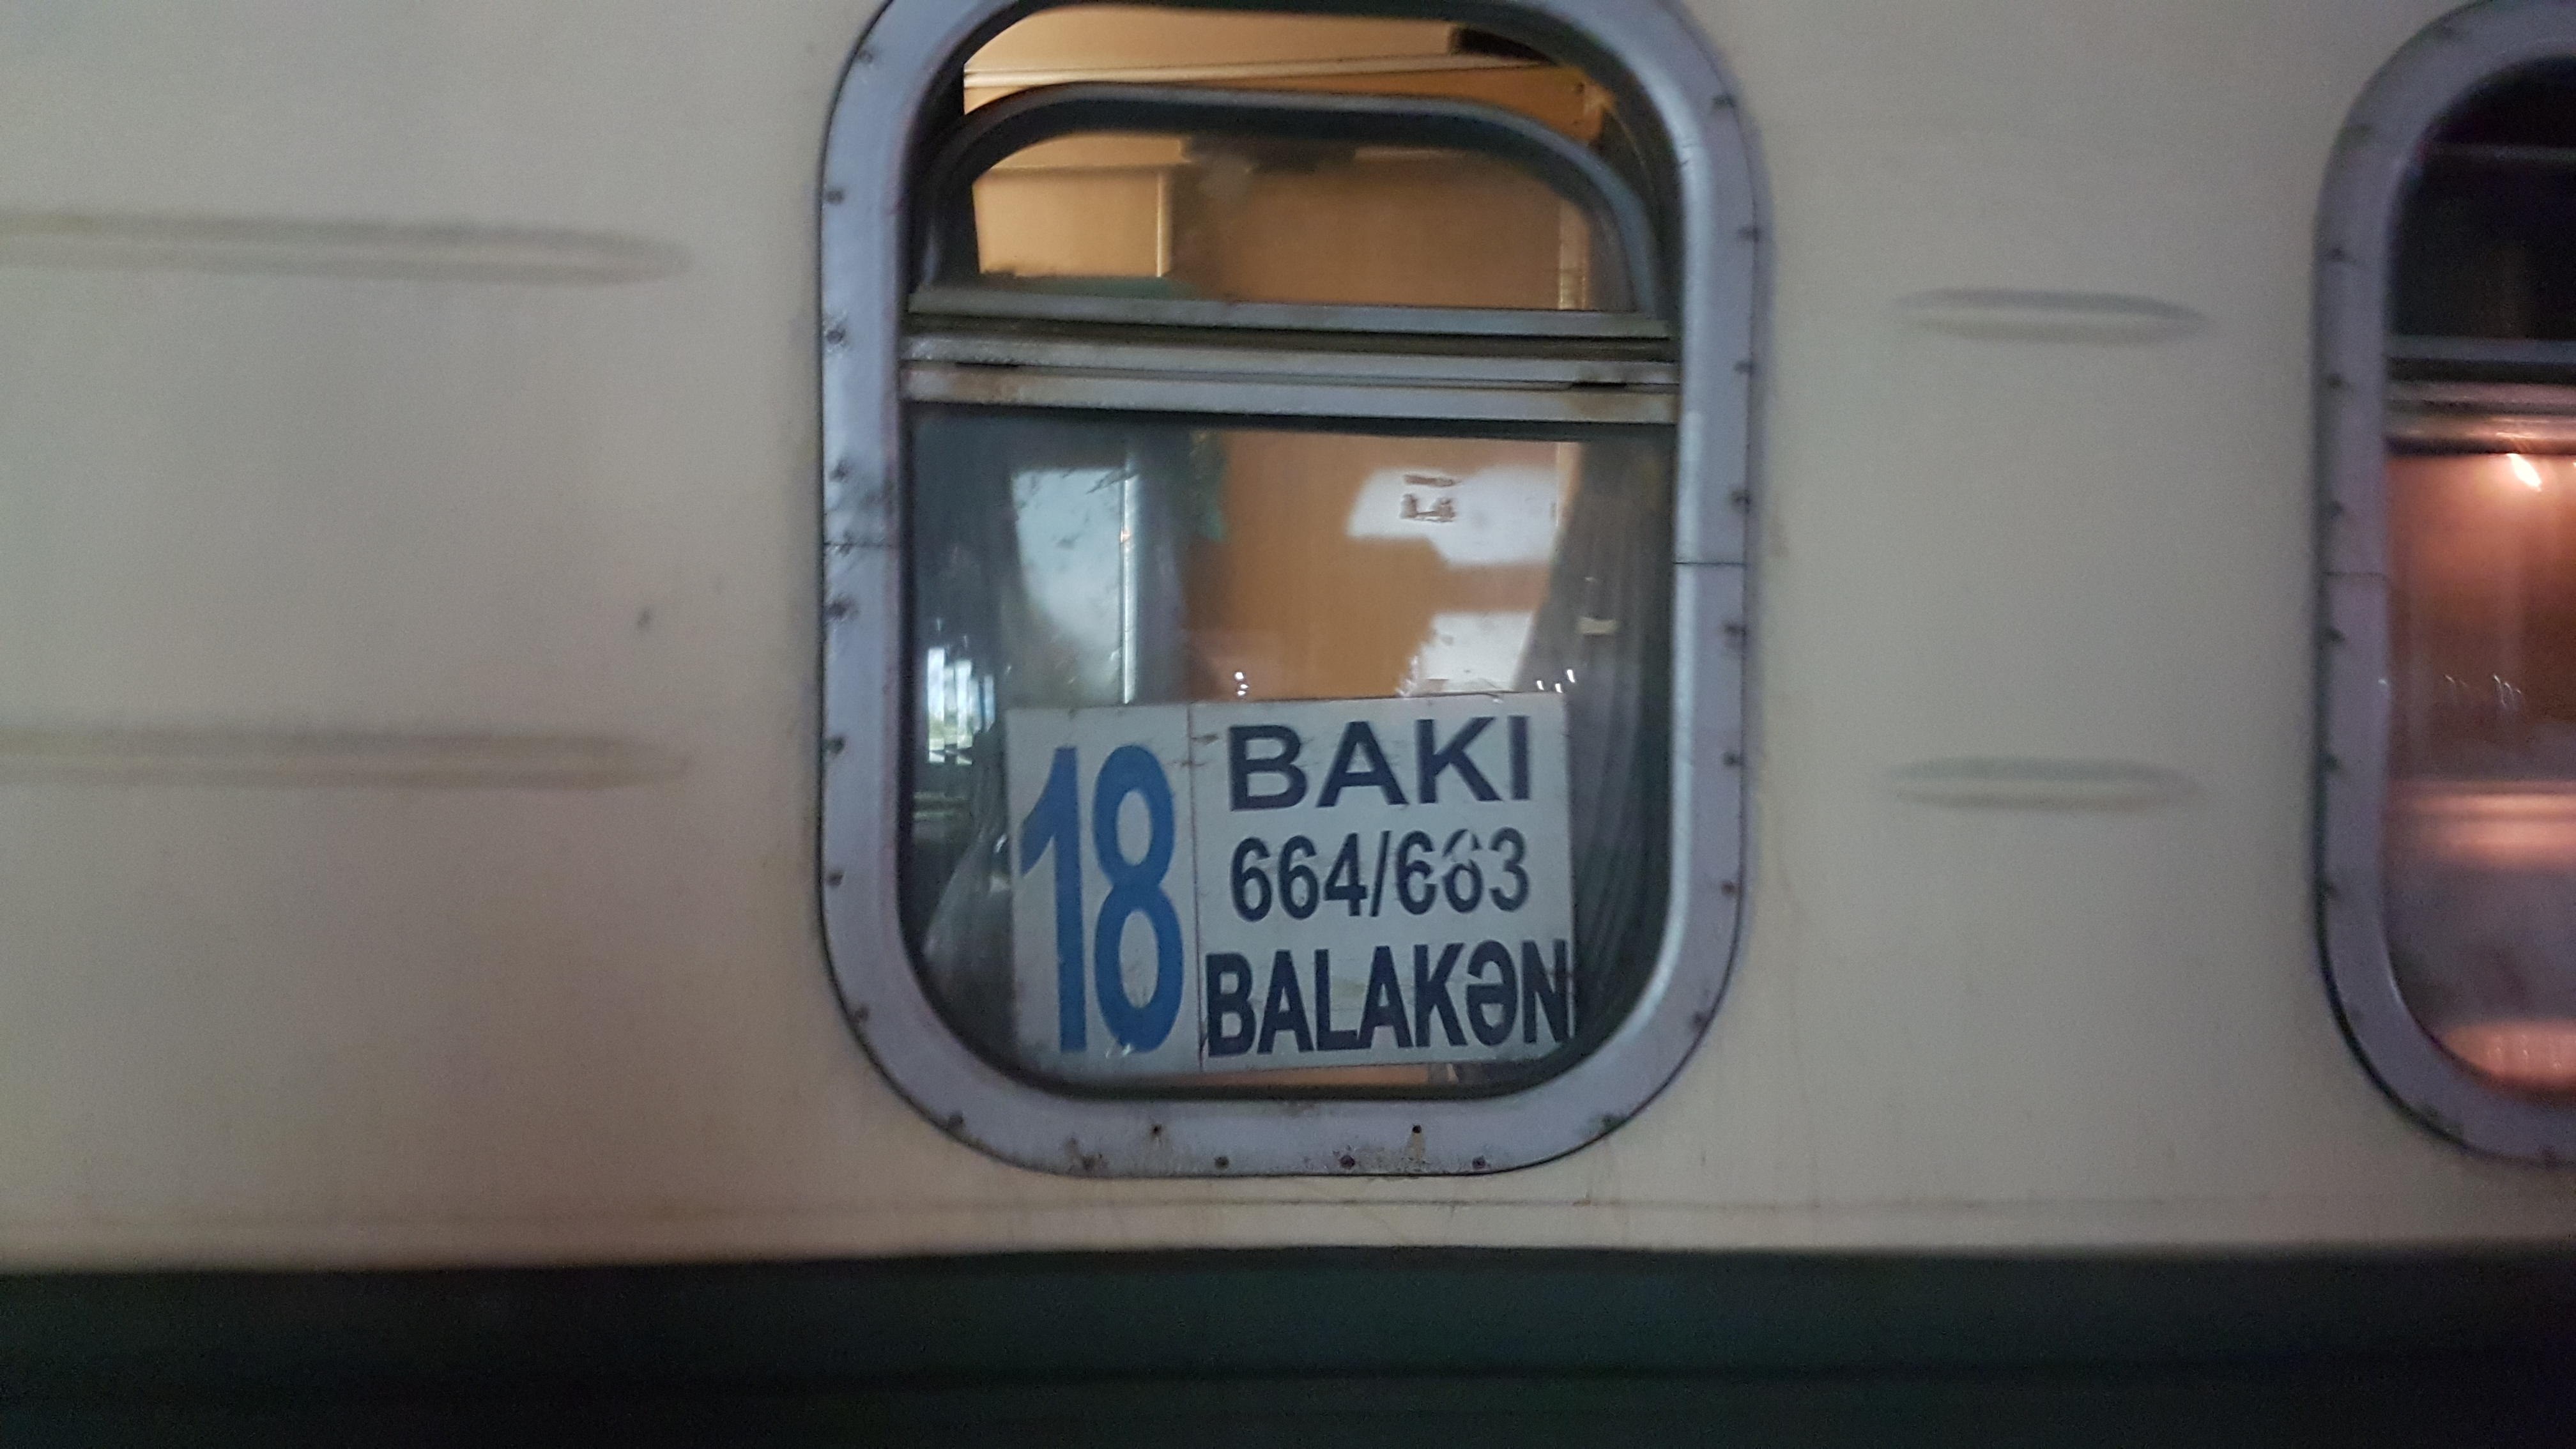 Train from Baku to Balakan | How to Get From Baku to Georgia